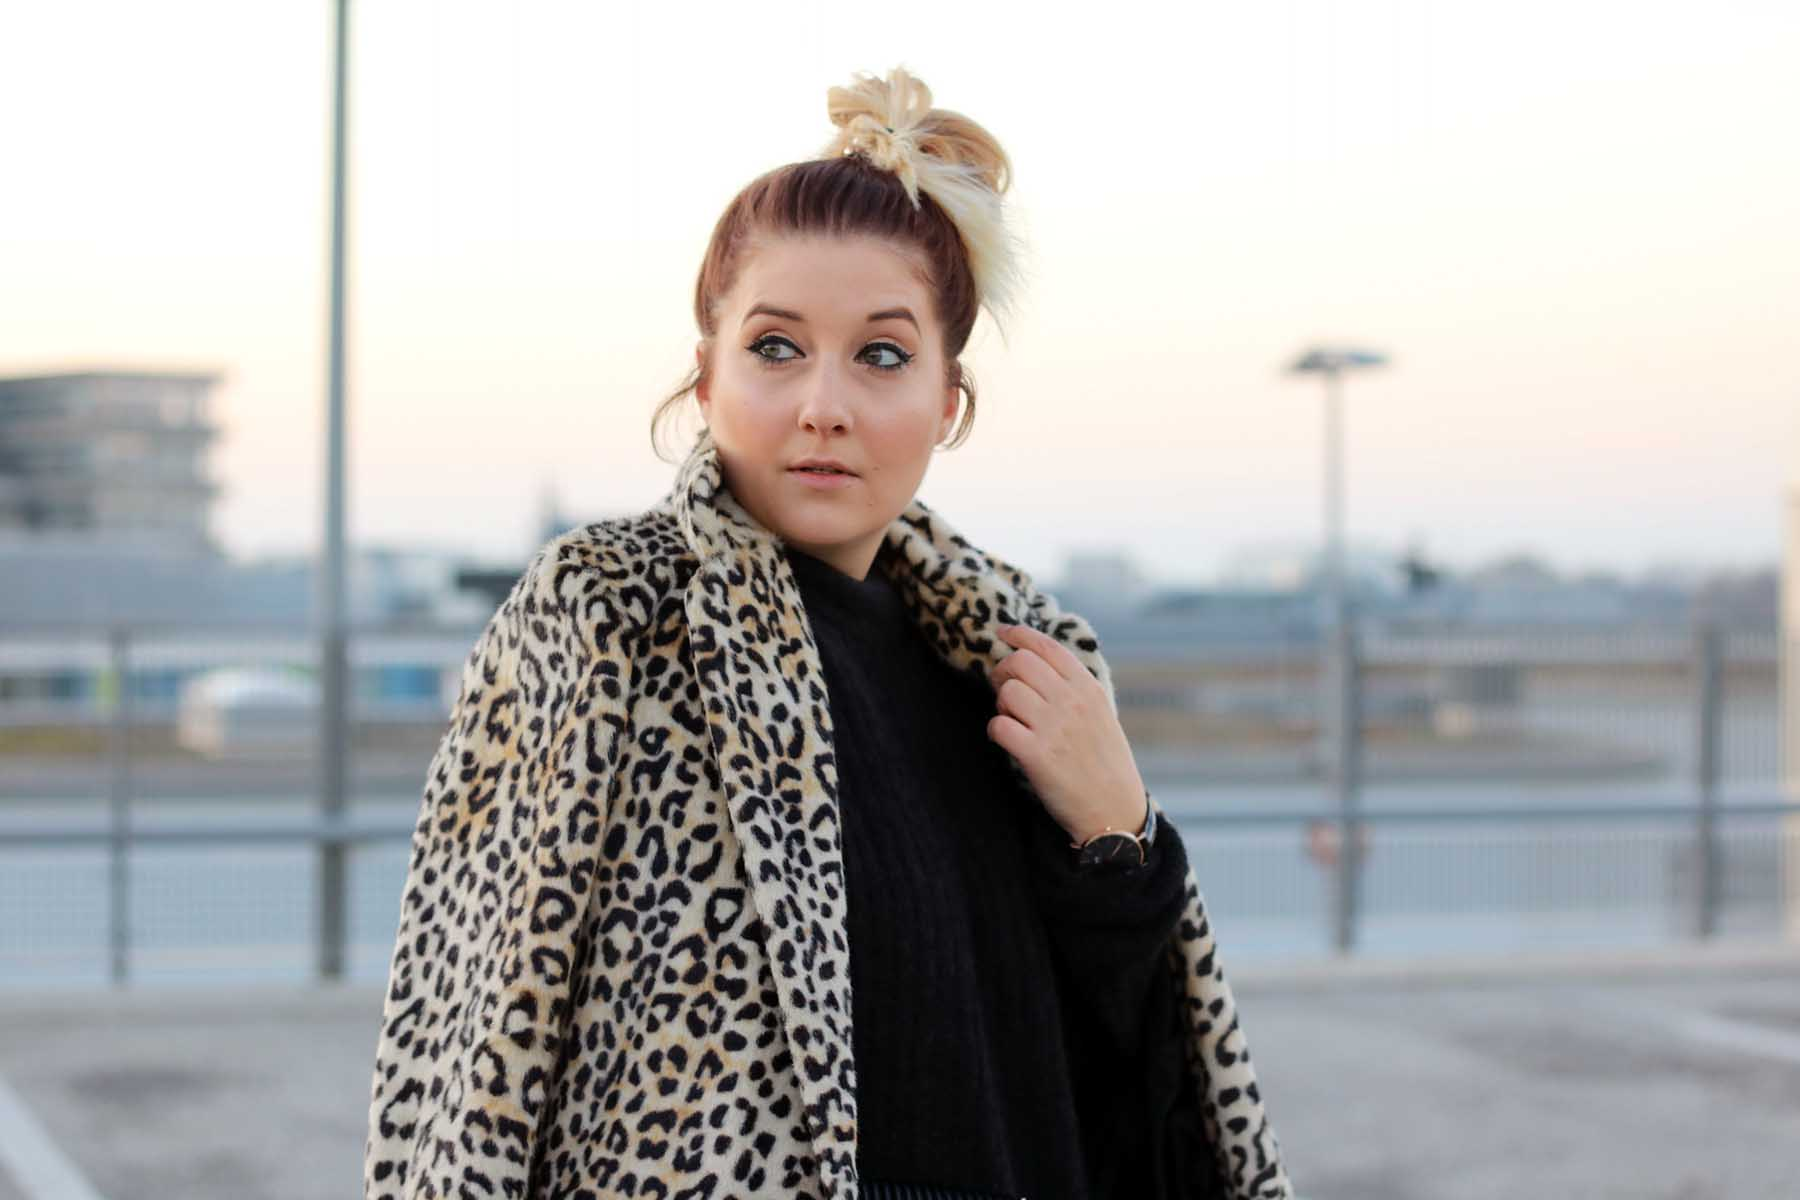 outift-leomantel-mantel-winter-leoparden-modeblog-fashionblog-look-braunschweig21